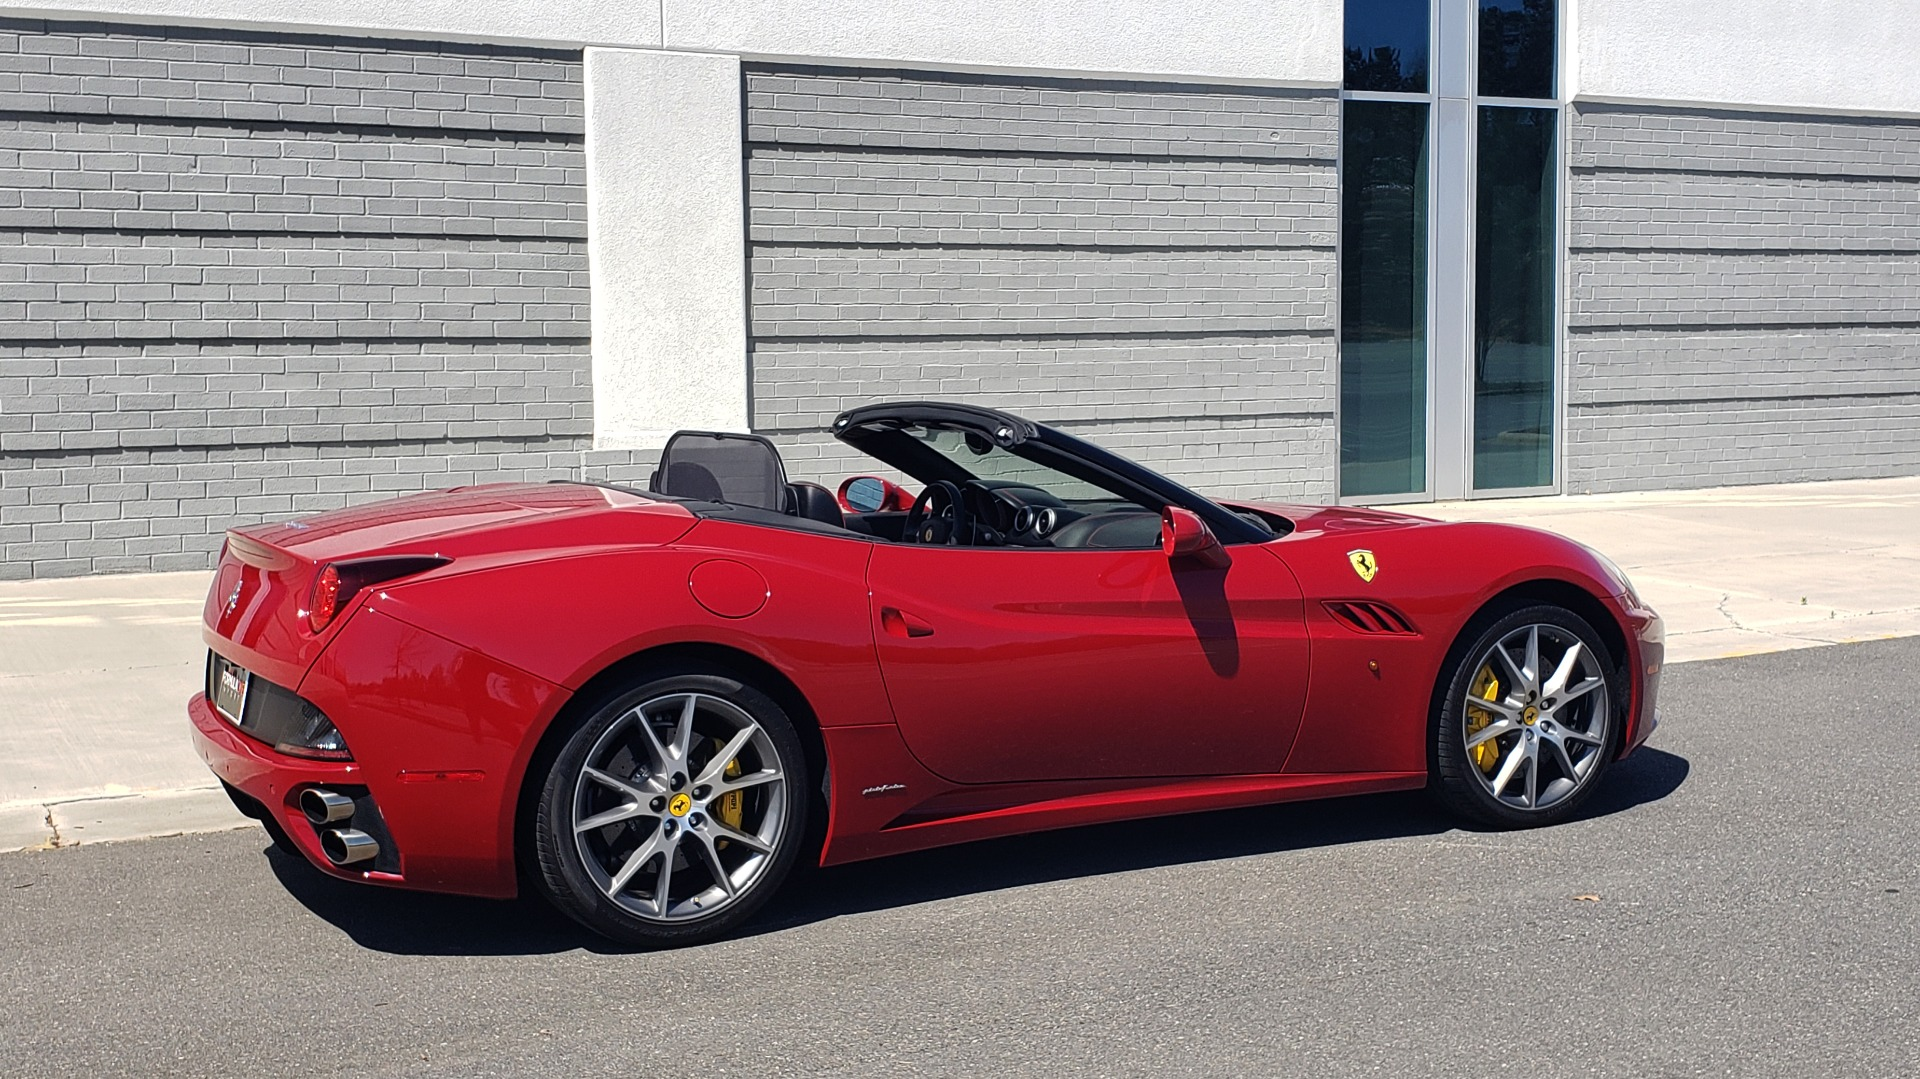 Used 2014 Ferrari CALIFORNIA CONVERTIBLE 2+2 / NAV / PARK SENS / CAMERA / TPMS for sale Sold at Formula Imports in Charlotte NC 28227 15